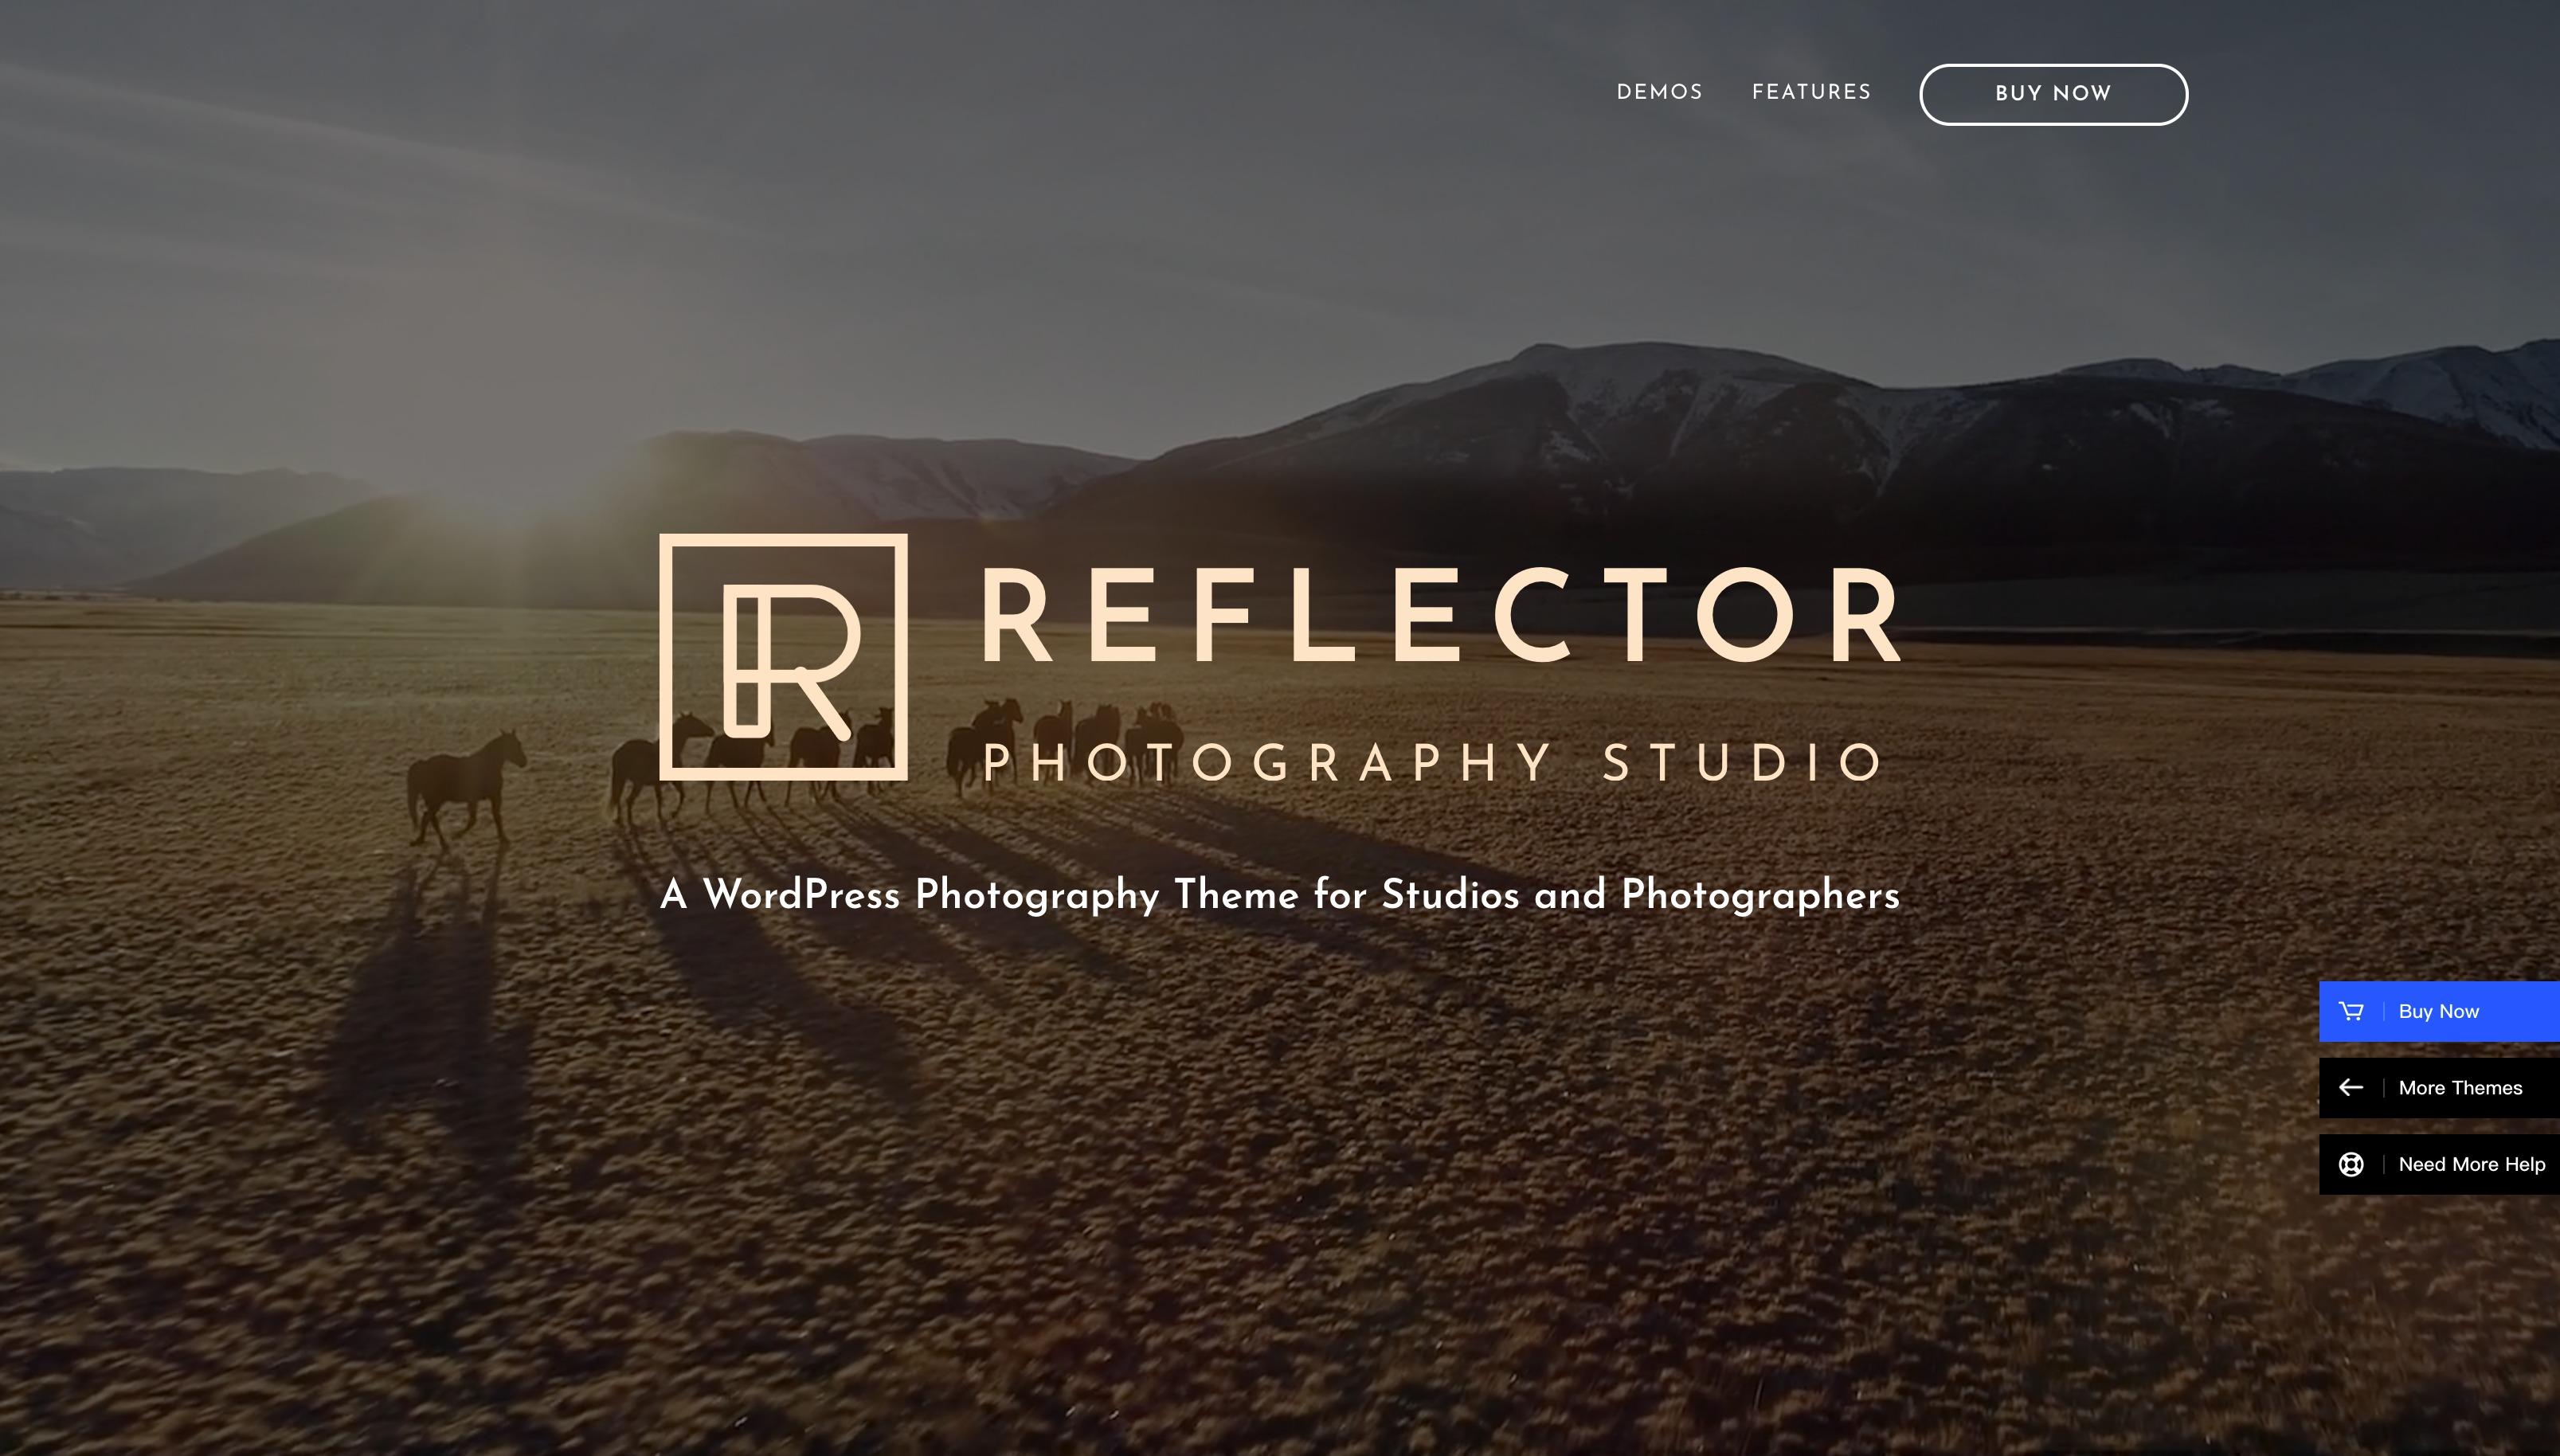 Reflector-摄影工作室图片展示WordPress主题